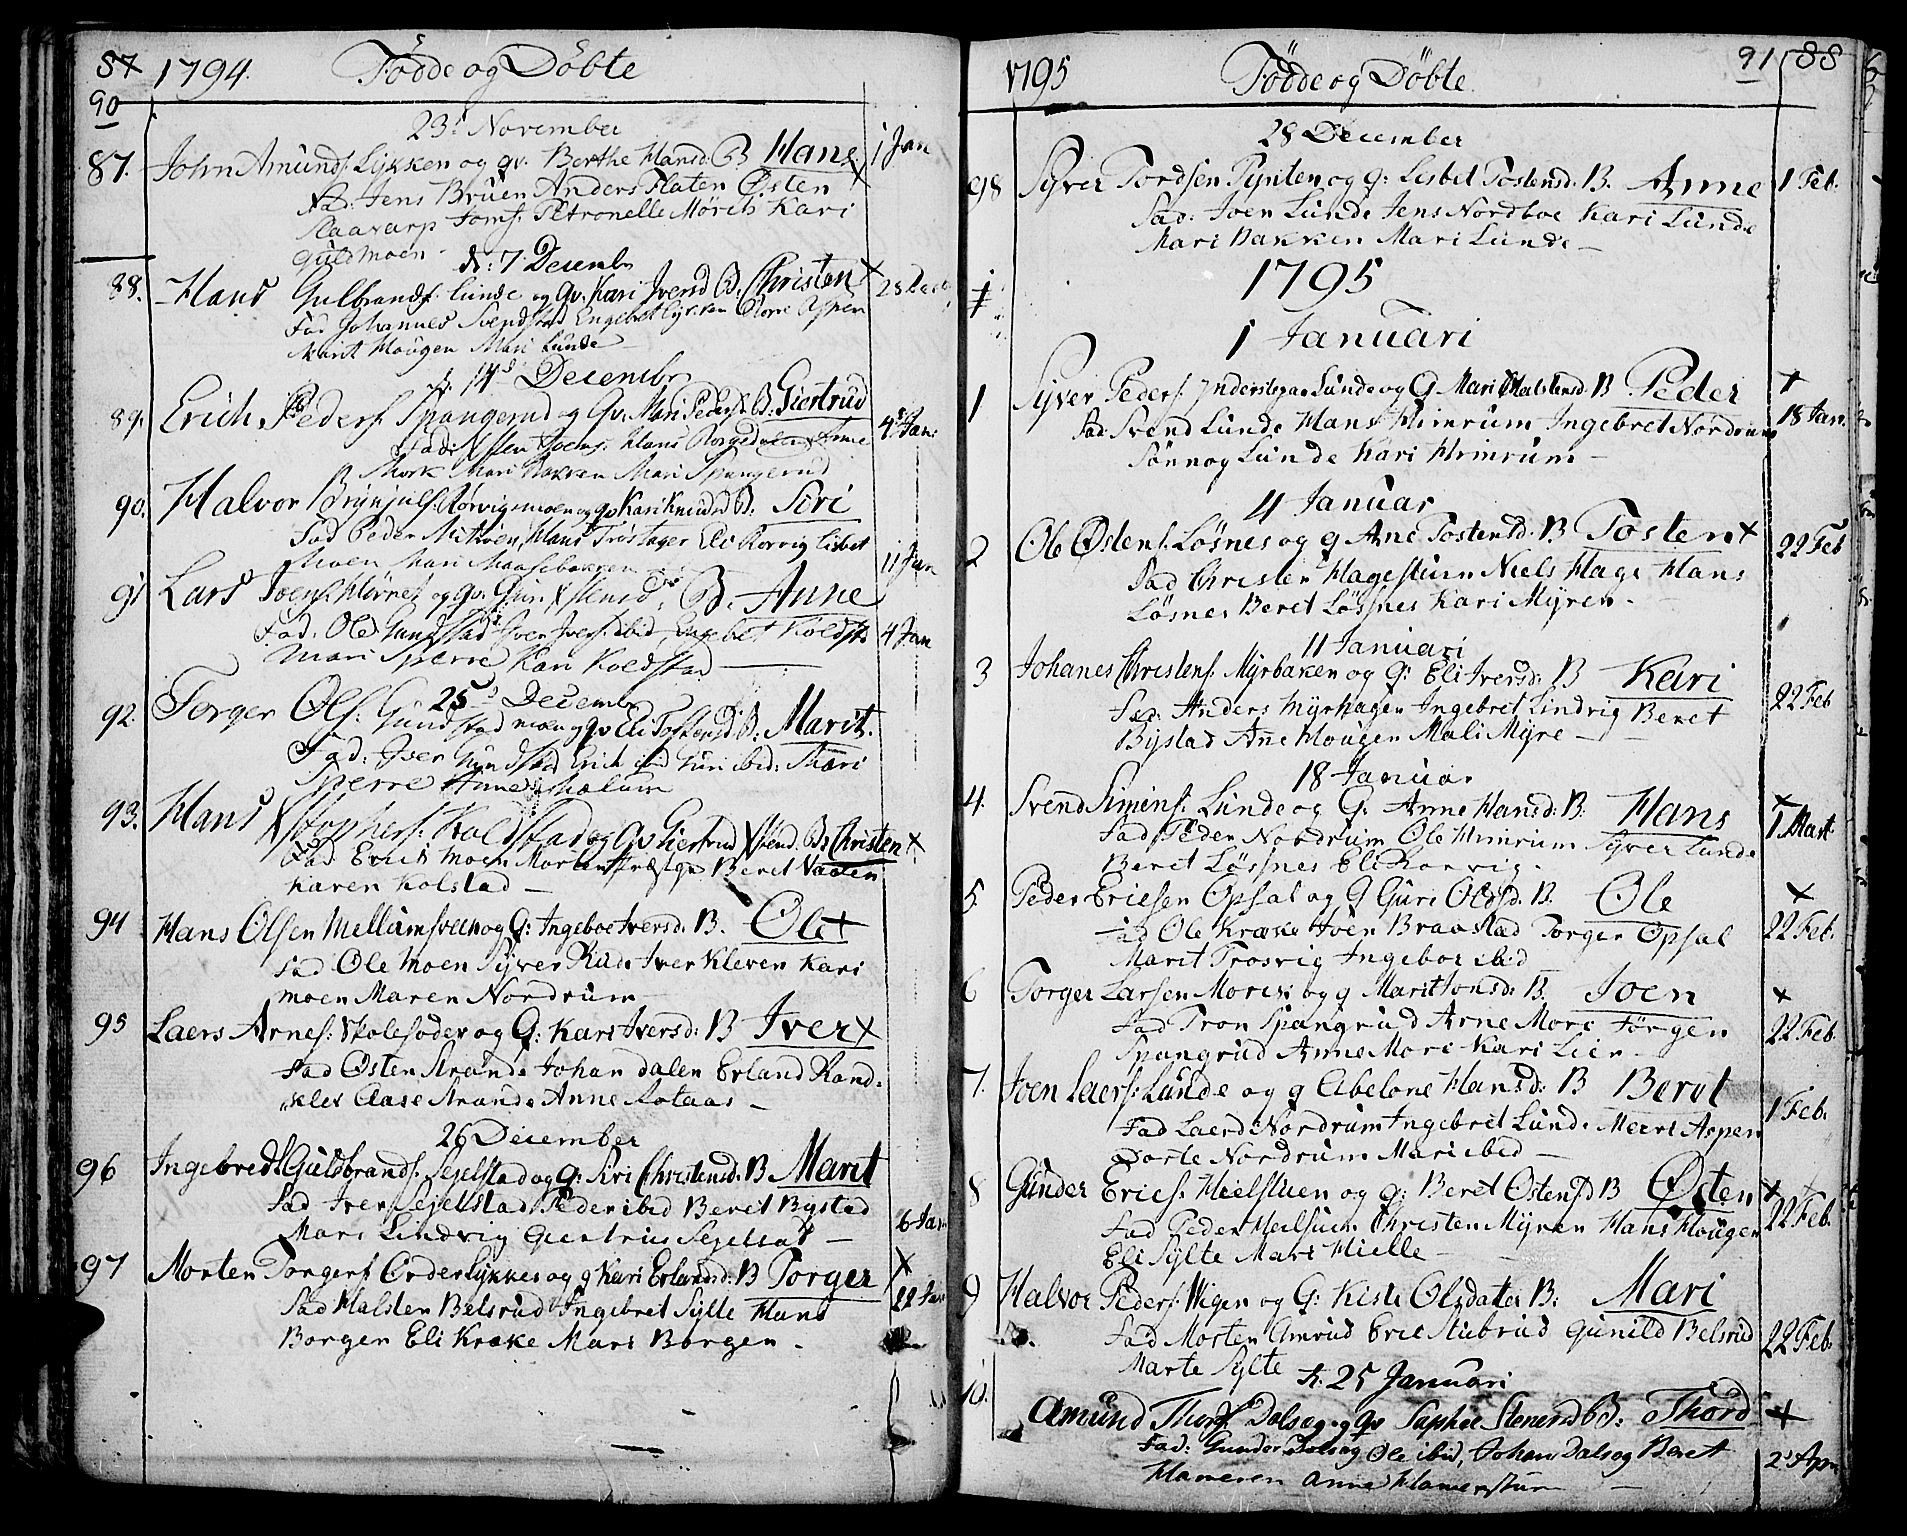 SAH, Ringebu prestekontor, Ministerialbok nr. 3, 1781-1820, s. 90-91